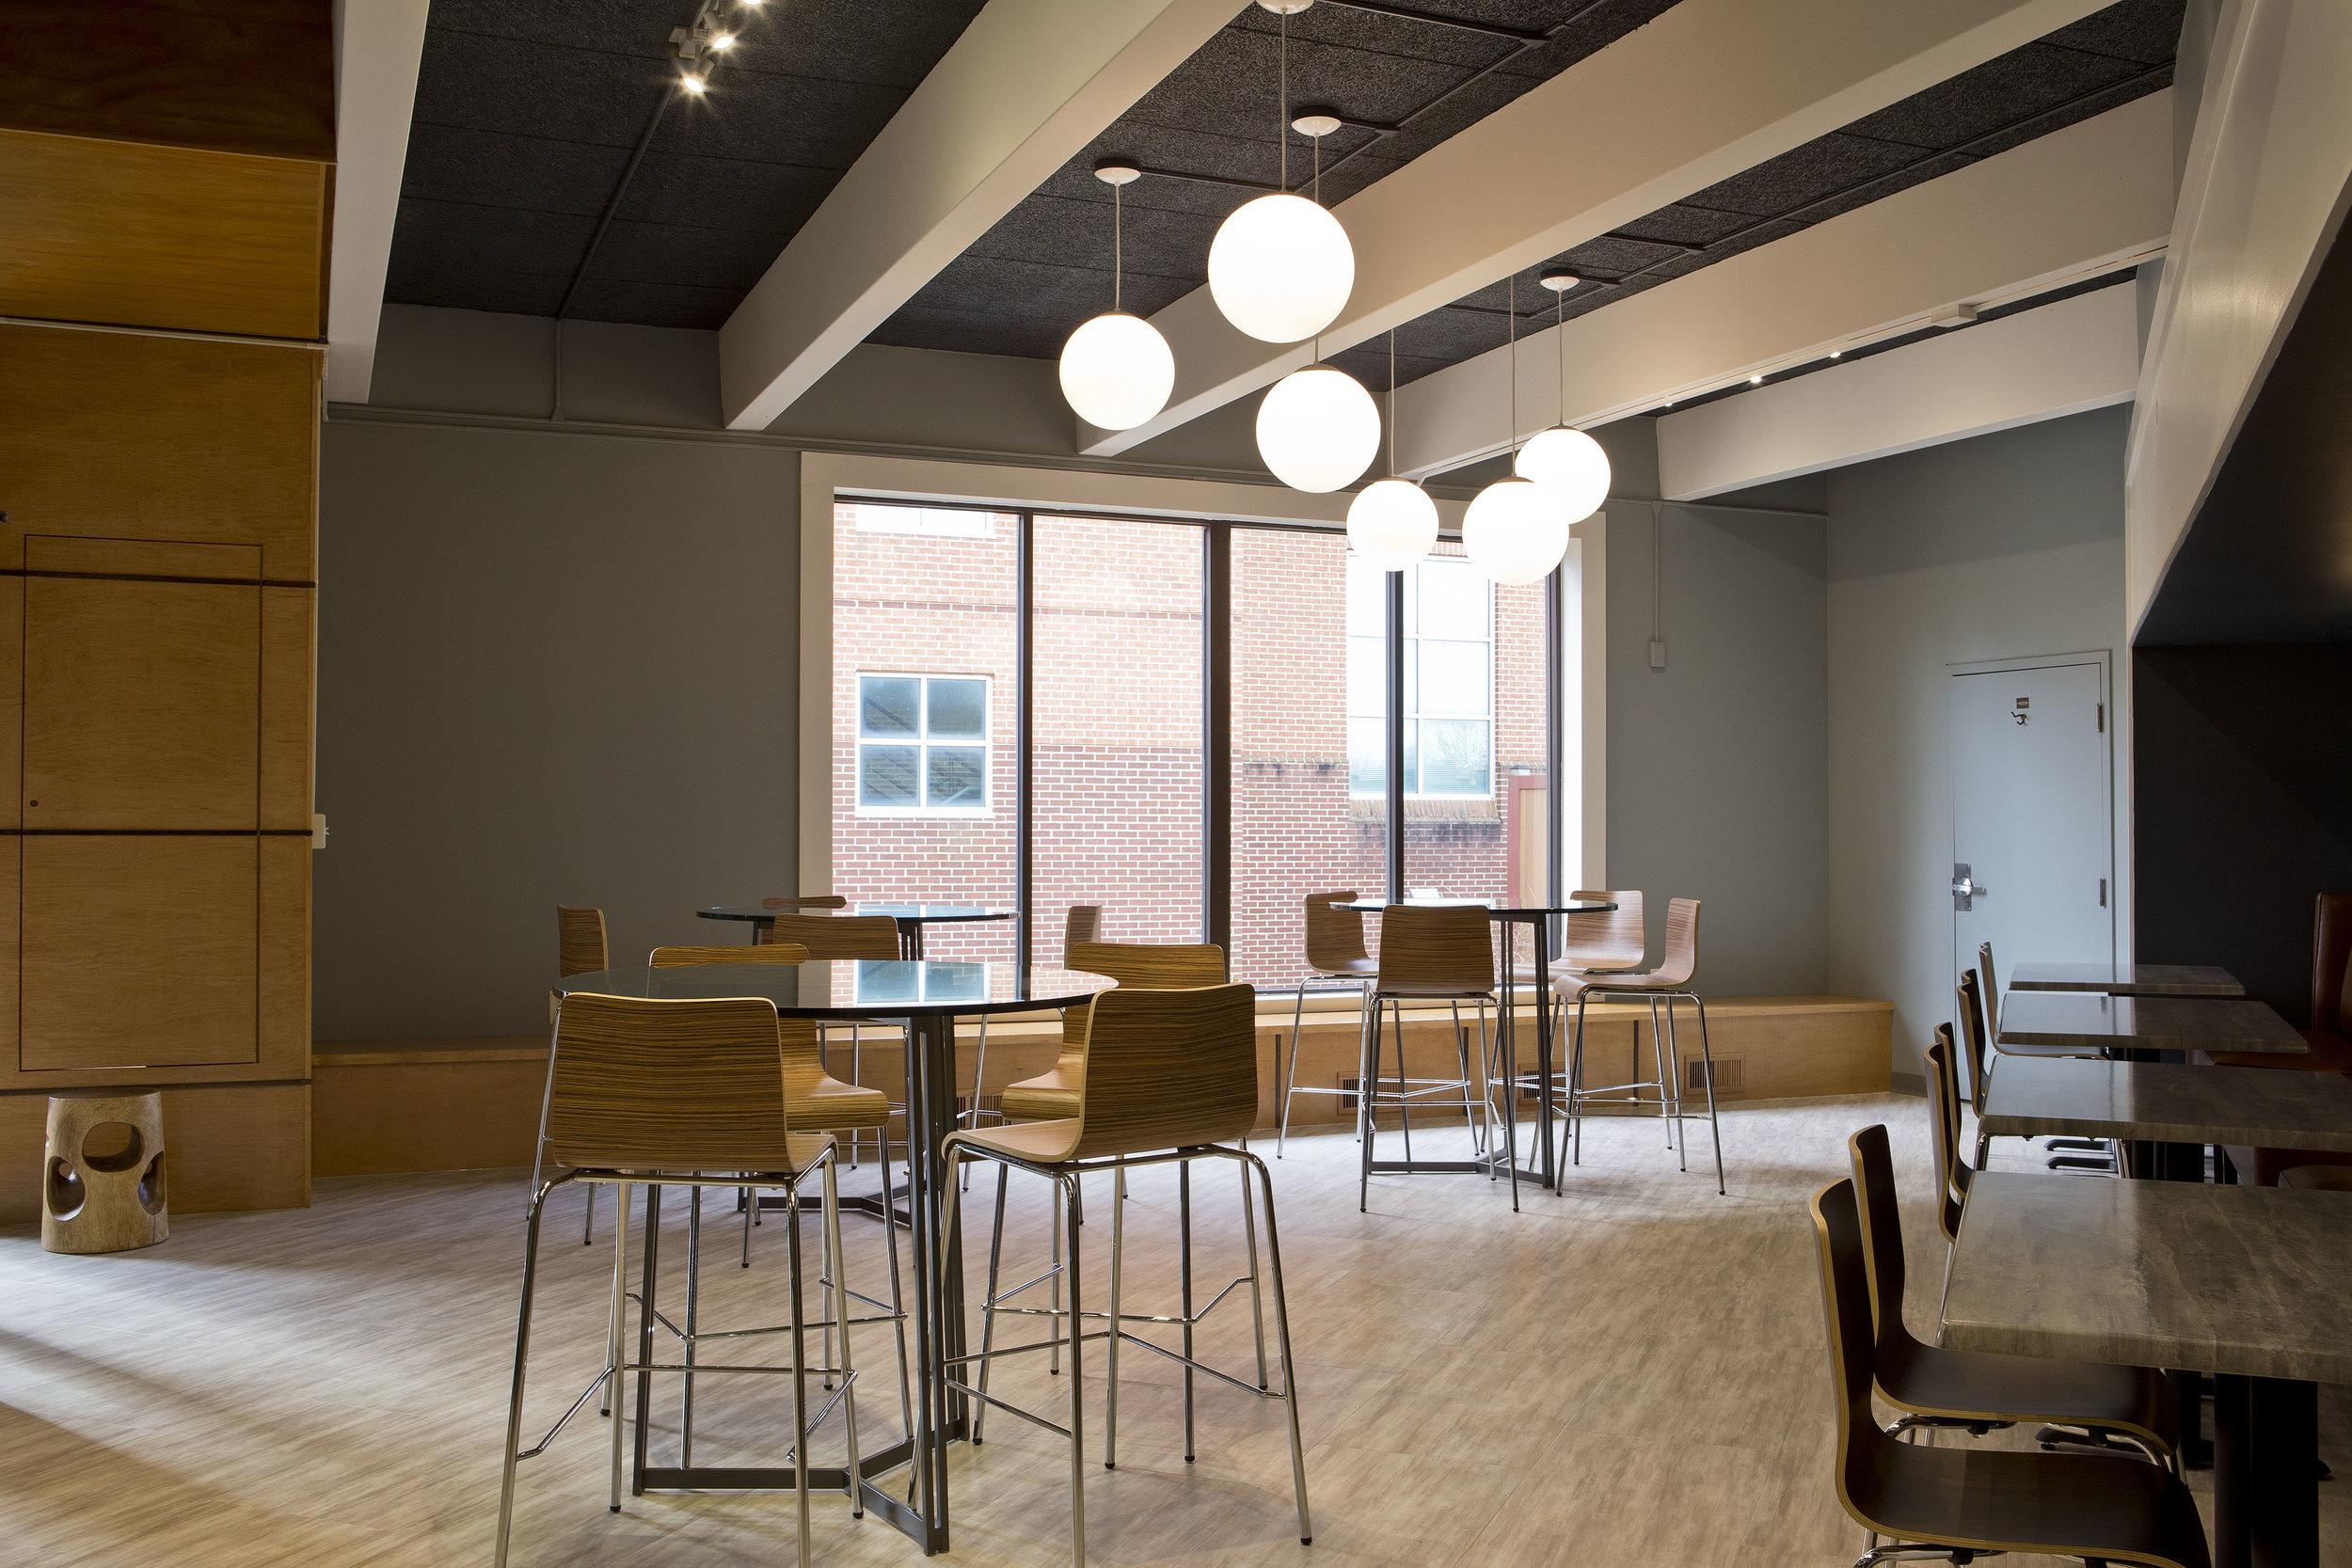 commercial-interior-designer-modern-university-design-study-meeting-room